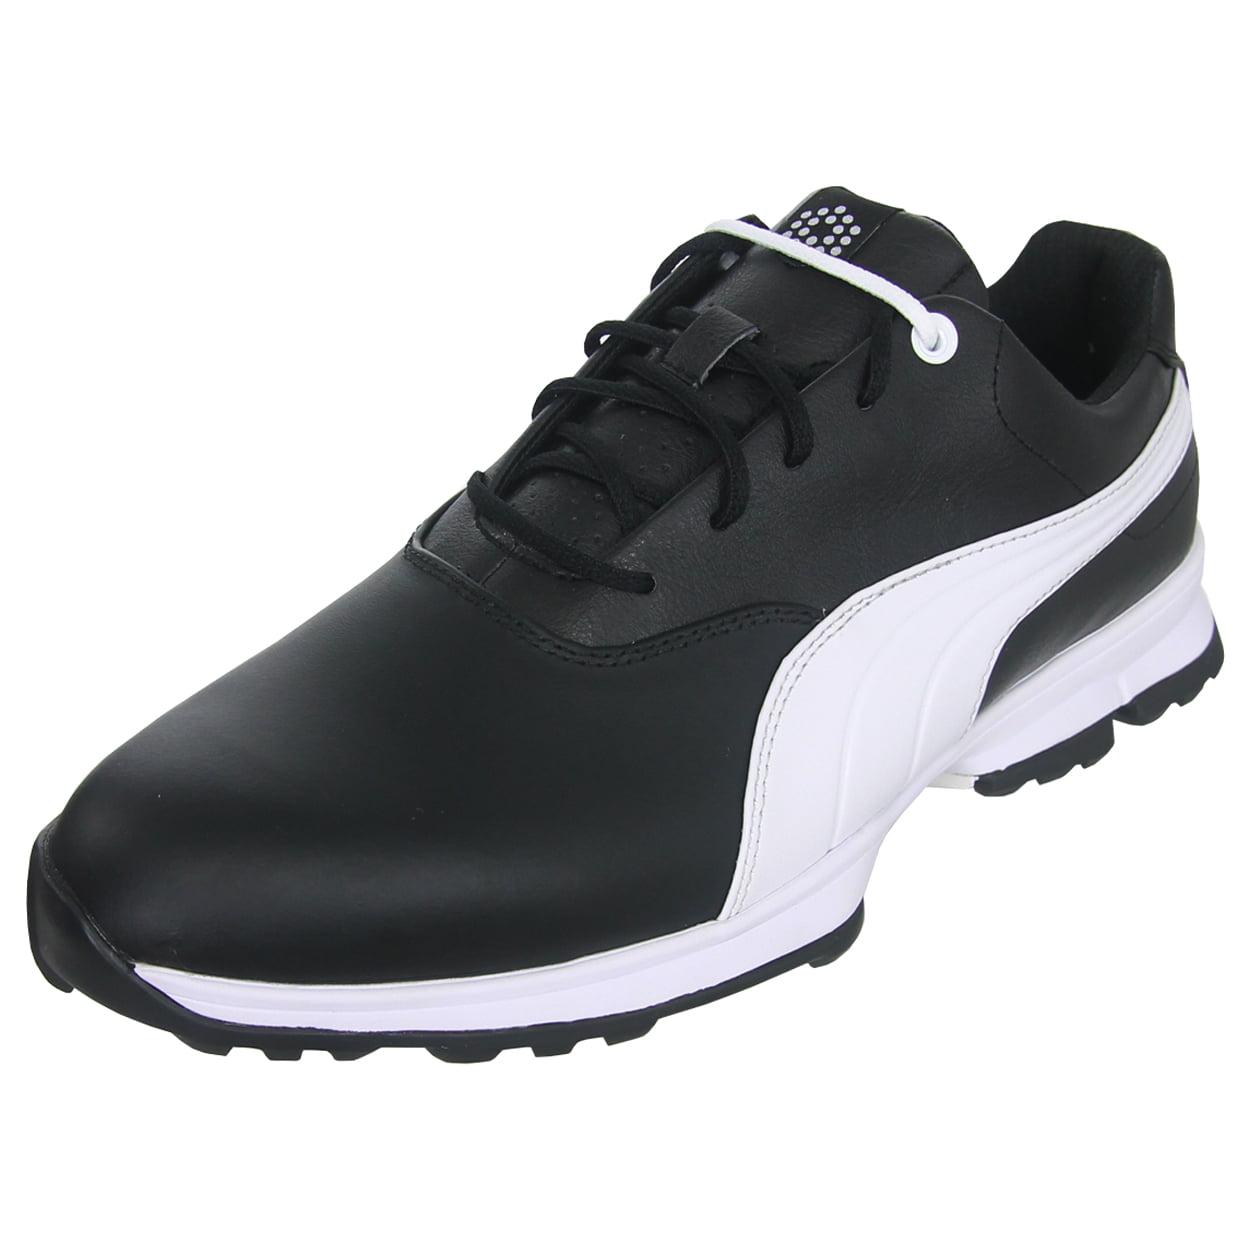 PUMA Ace Men's Leather Waterproof Golf Shoe, Brand New - by Puma